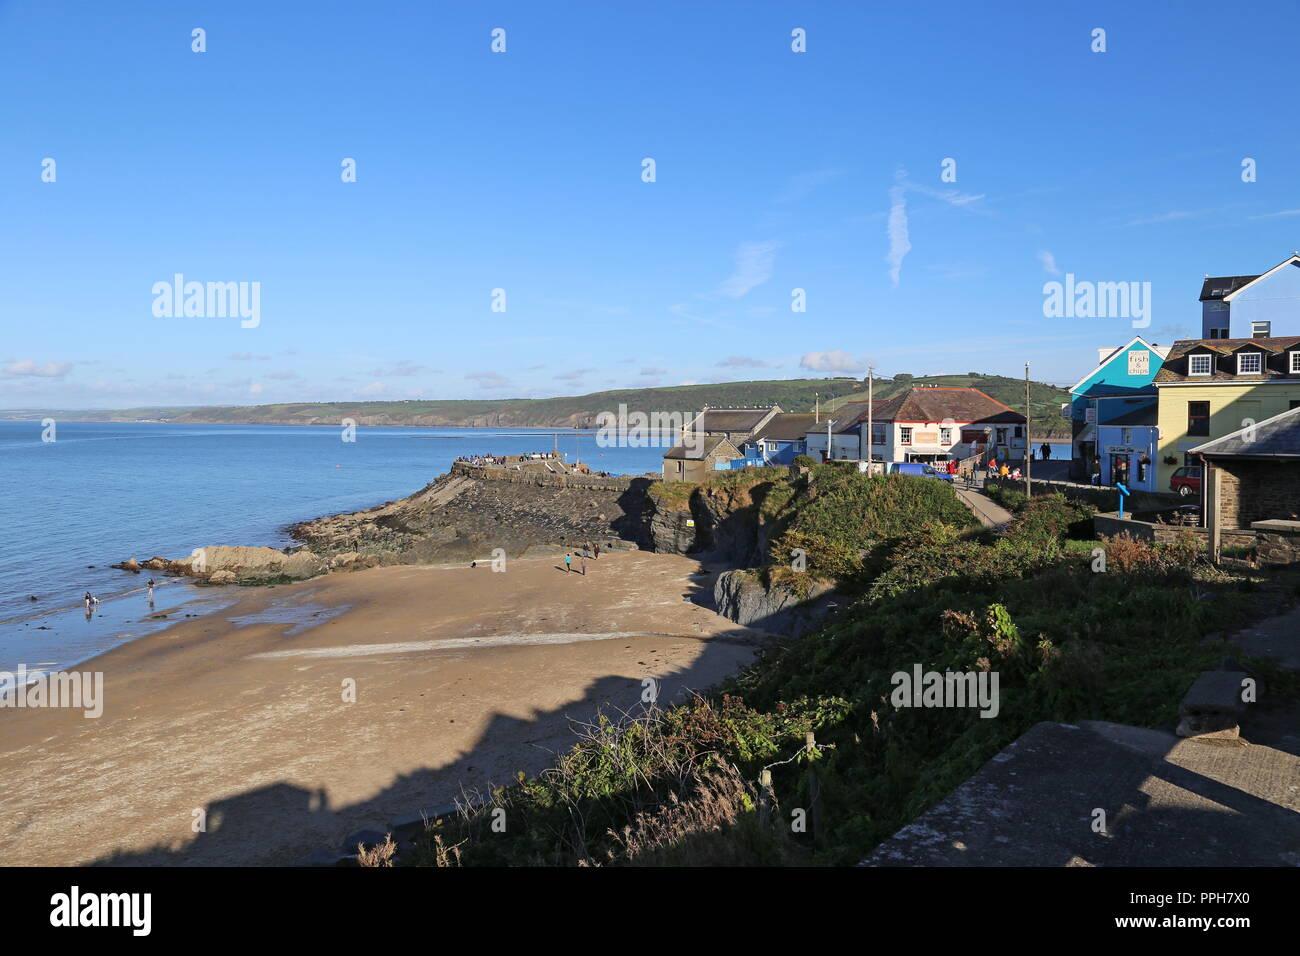 Dolau Beach, New Quay, Cardigan Bay, Ceredigion, Wales, Great Britain, United Kingdom, UK, Europe - Stock Image